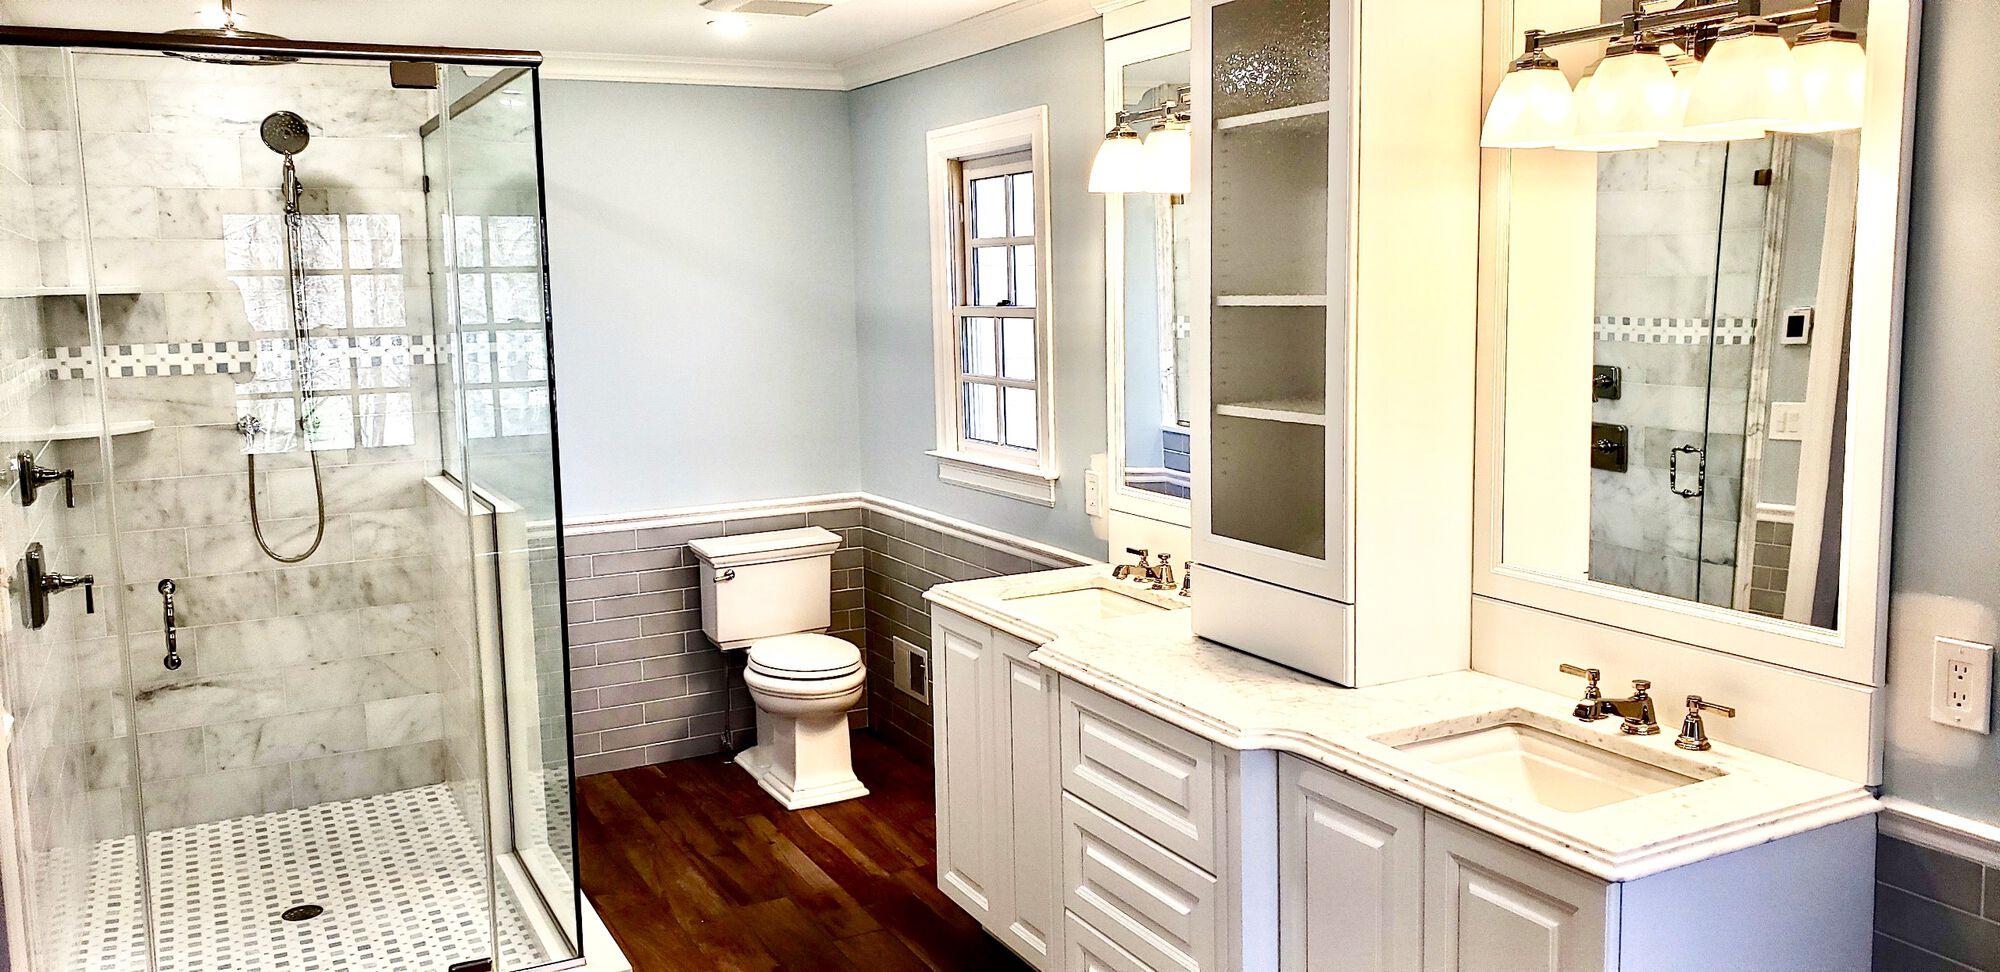 Custom Cabinet with Storage Tower, Porcelain Subway, Wood Plank Porcelain Tile, Glass Enclosure in North NJ